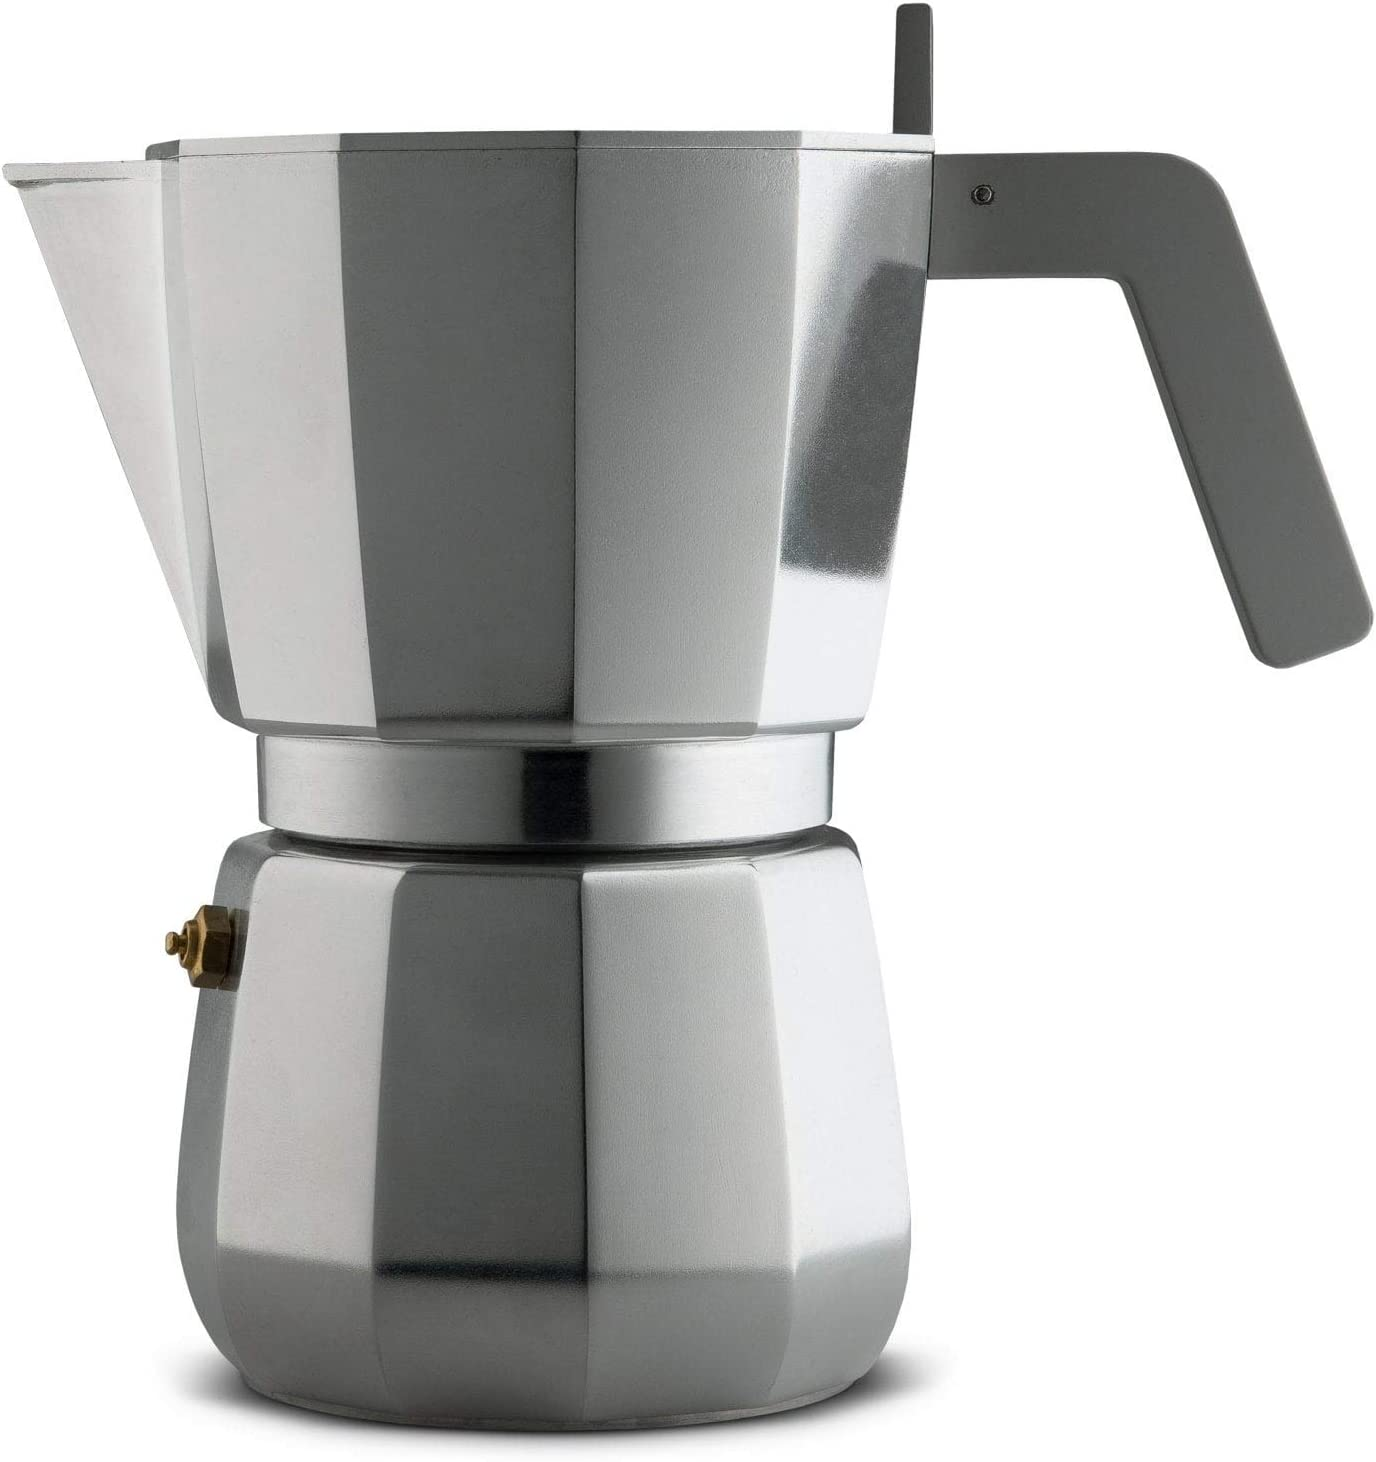 Alessi Moka DC06/9 FM - Cafetera para café exprés de diseño en aluminio fundido mango y pomo en PA, 9 tazas gris